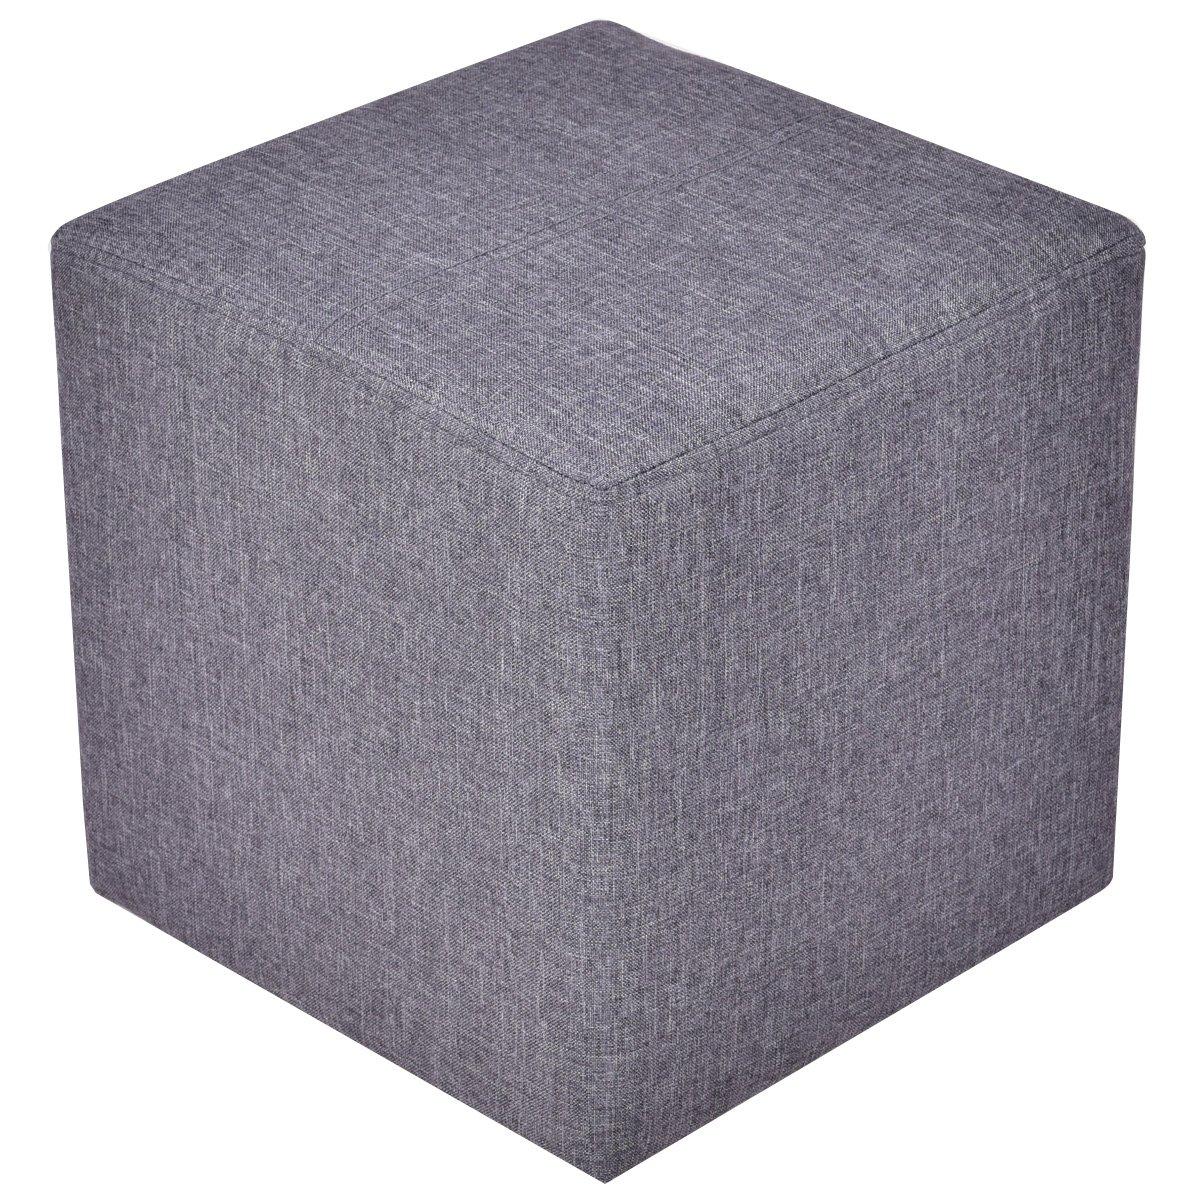 Giantex Linen Ottoman Cube Square Foot Stool Seat Wood Frame, Gray